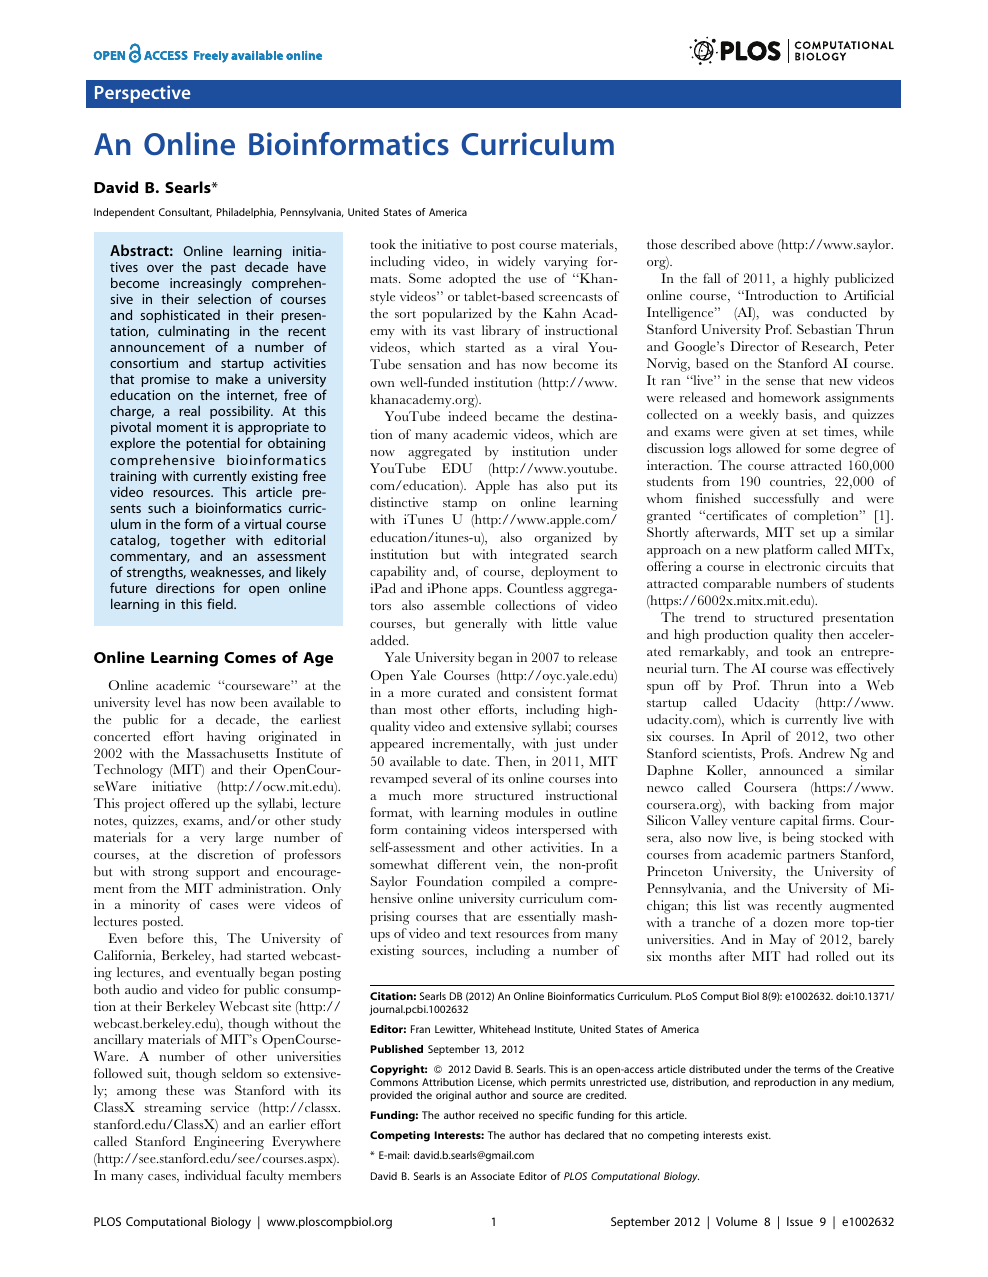 An Online Bioinformatics Curriculum – topic of research